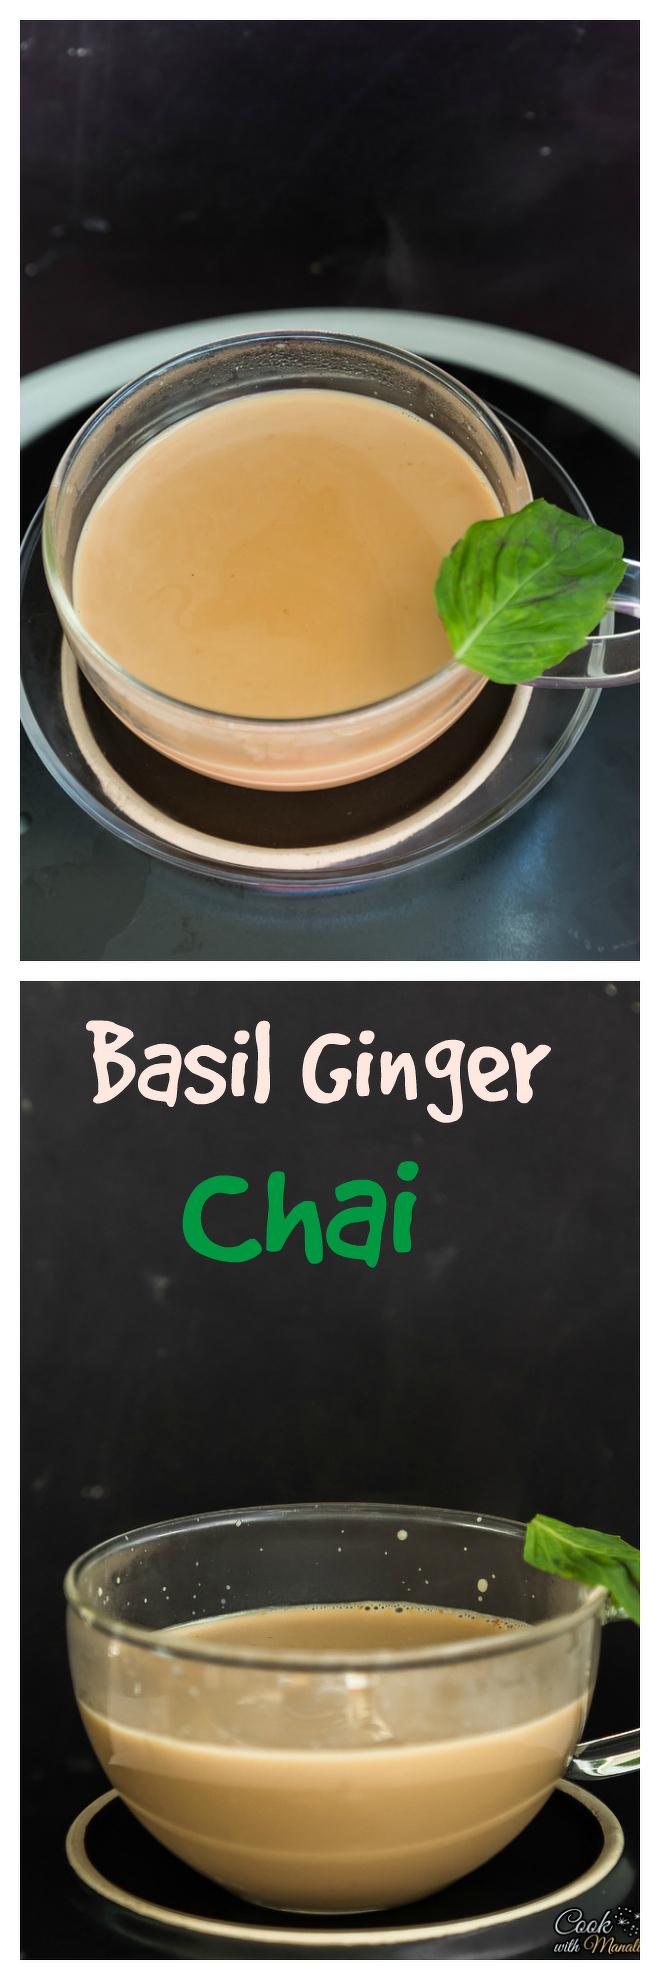 Basil Ginger Chai Collage-nocwm